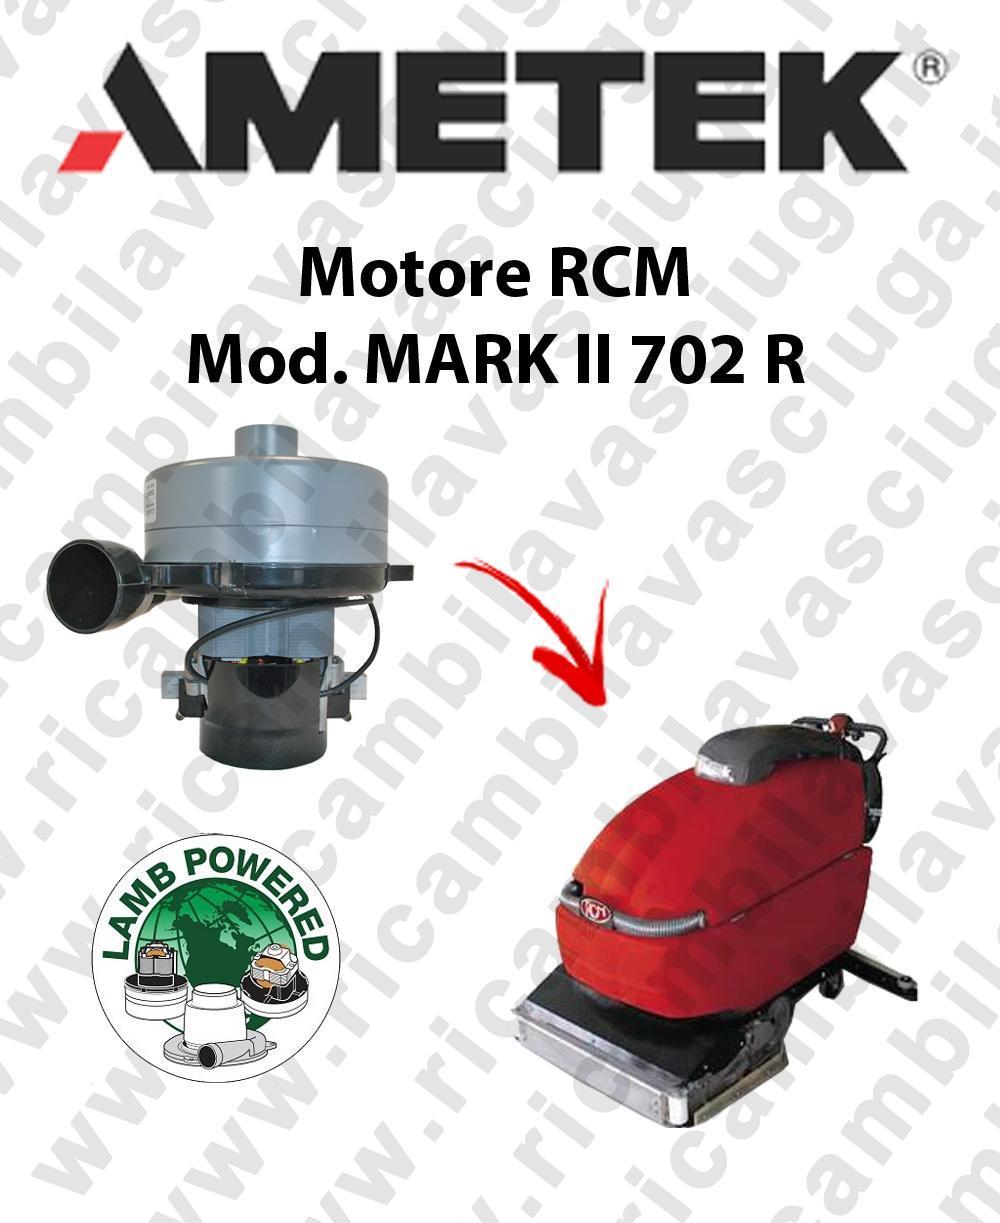 MARK II 702 R Vacuum motor LAMB AMETEK scrubber dryer RCM